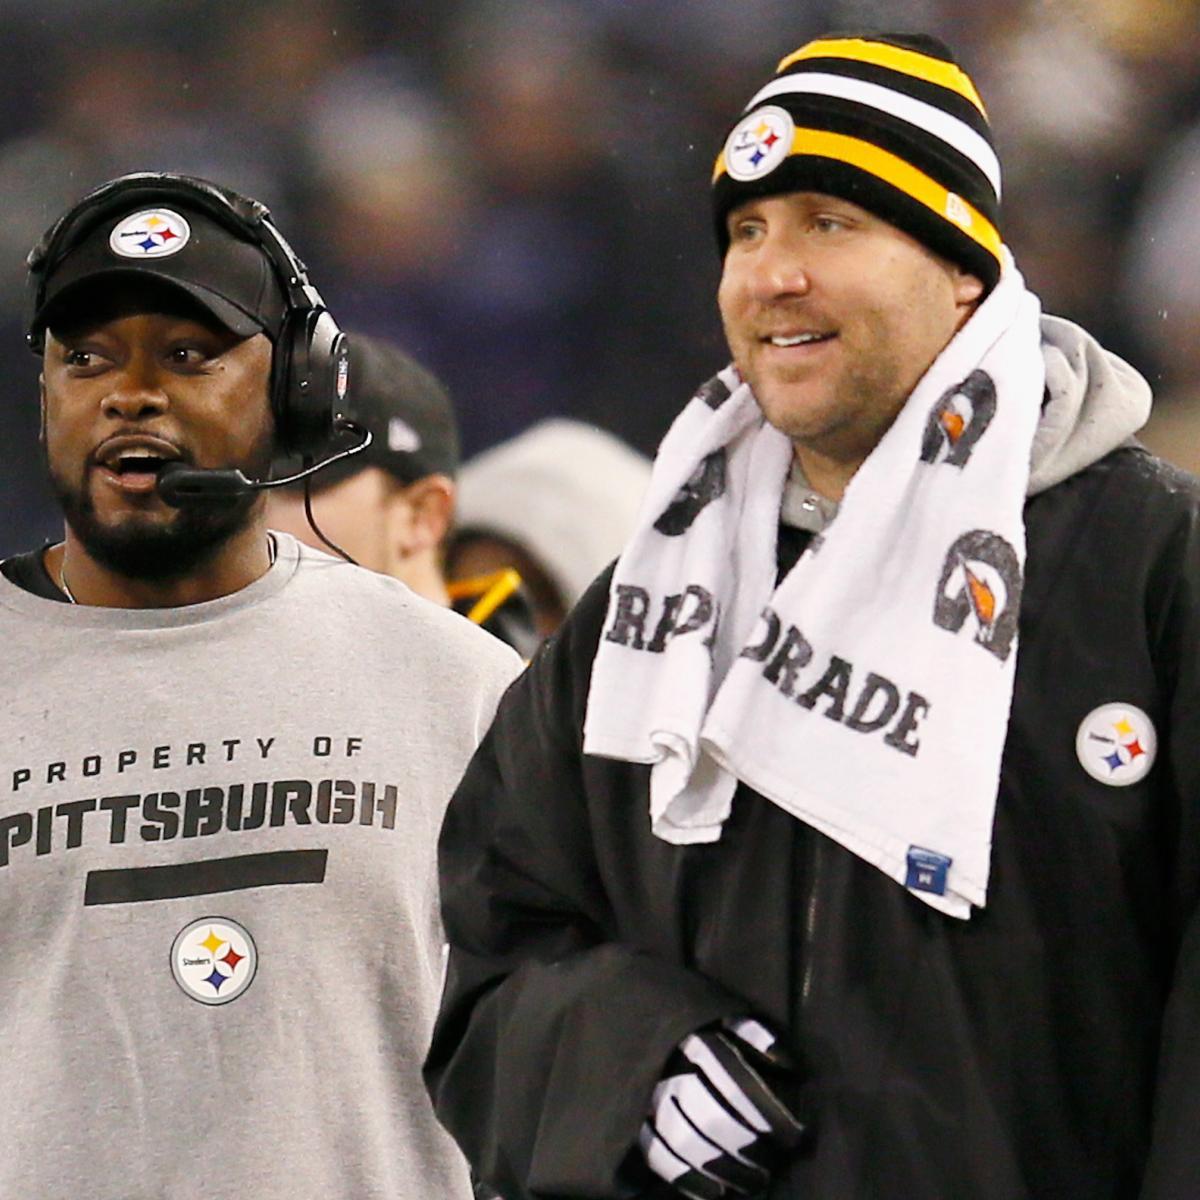 Ben Roethlisberger Injury: Updates On Steelers QB's